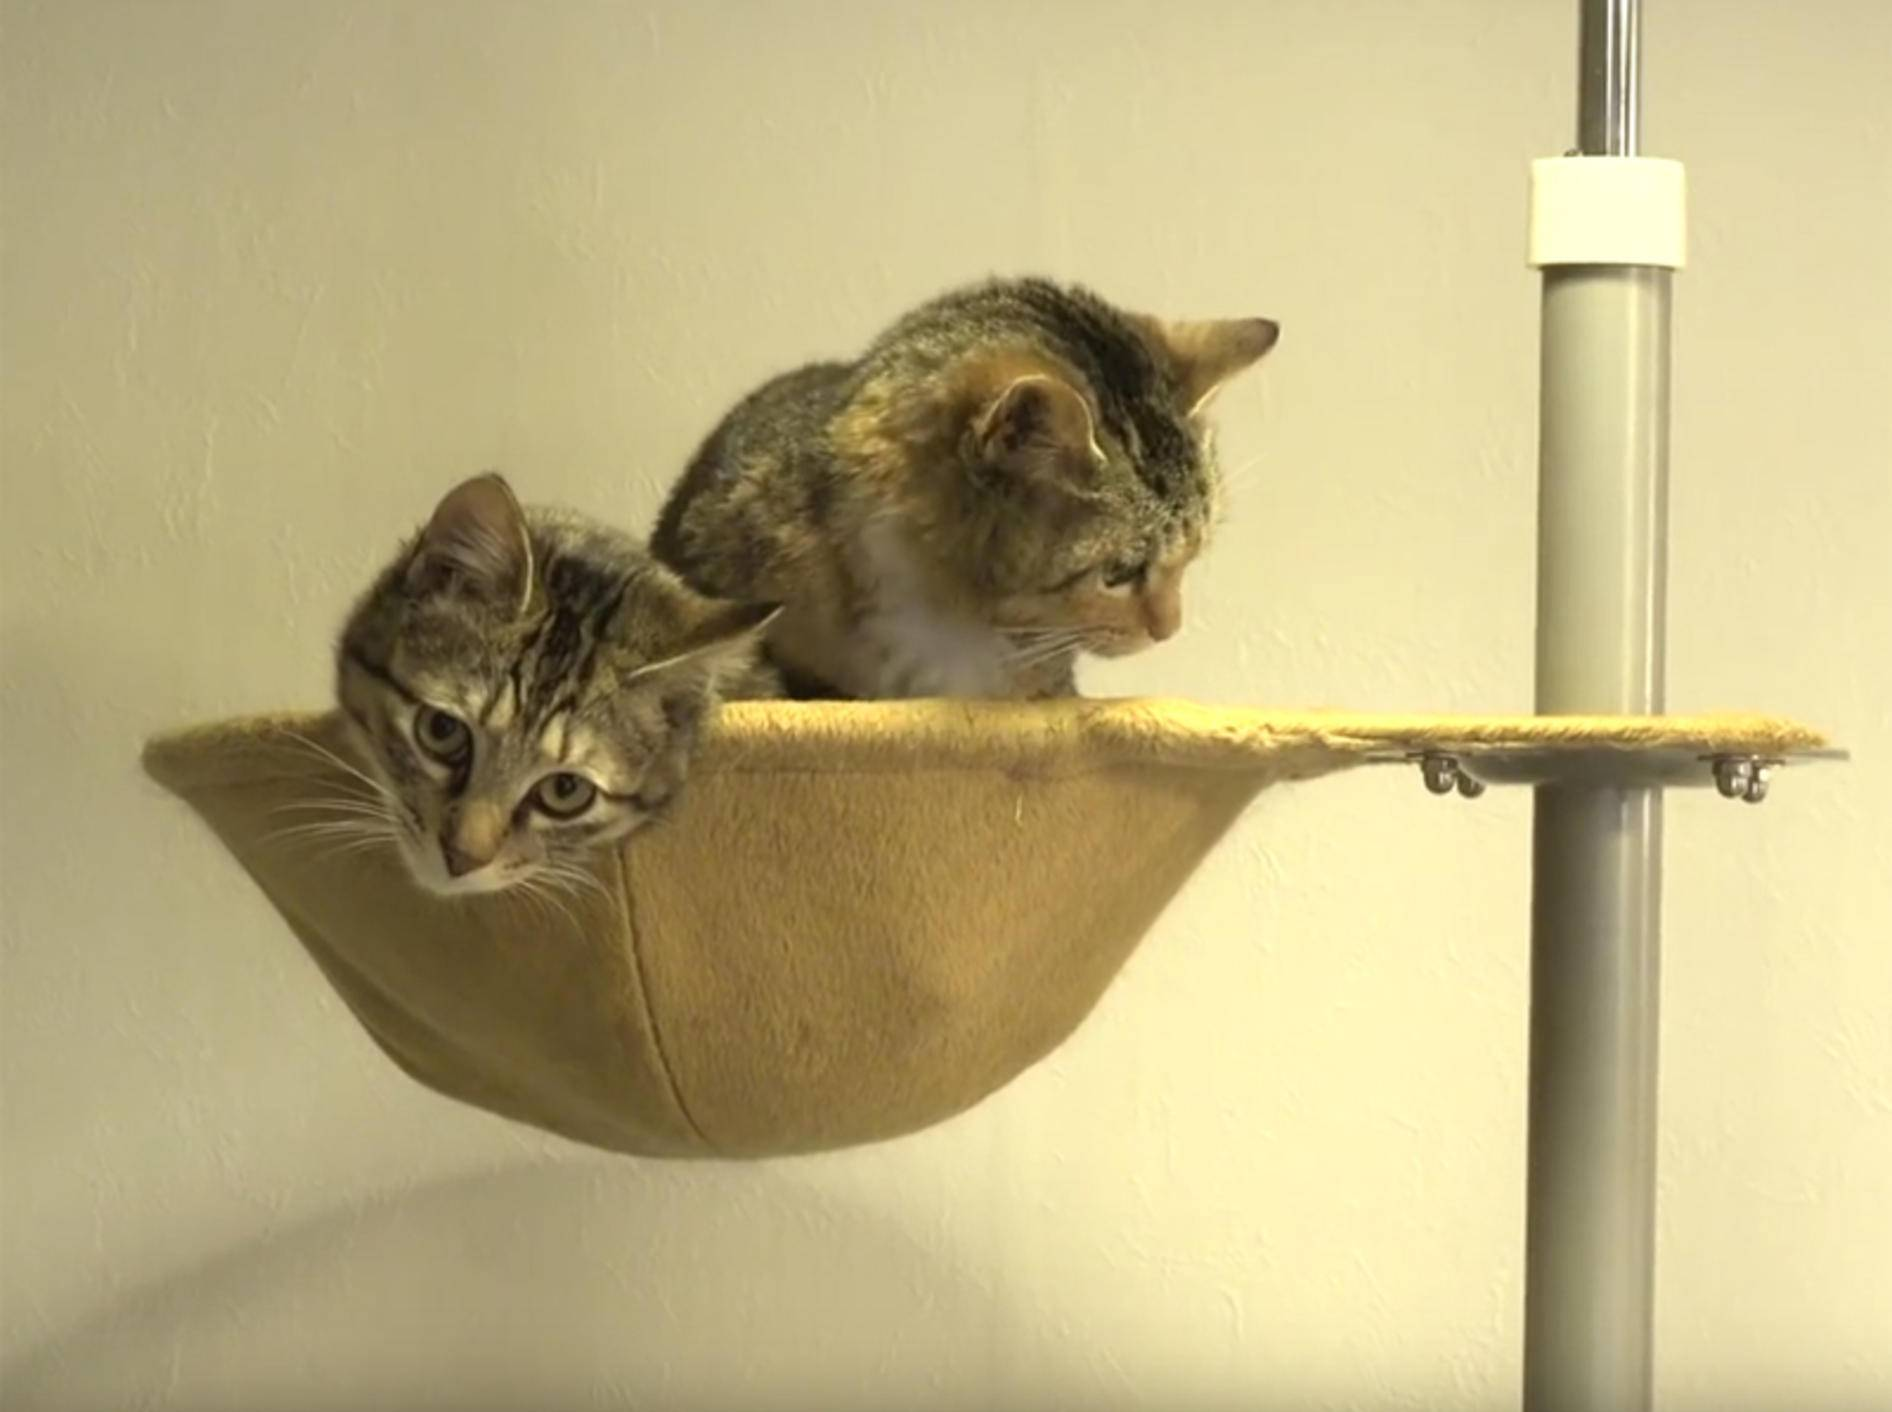 Ehemalige Streunerkätzchen kuscheln zusammen – YouTube / 10 Cats